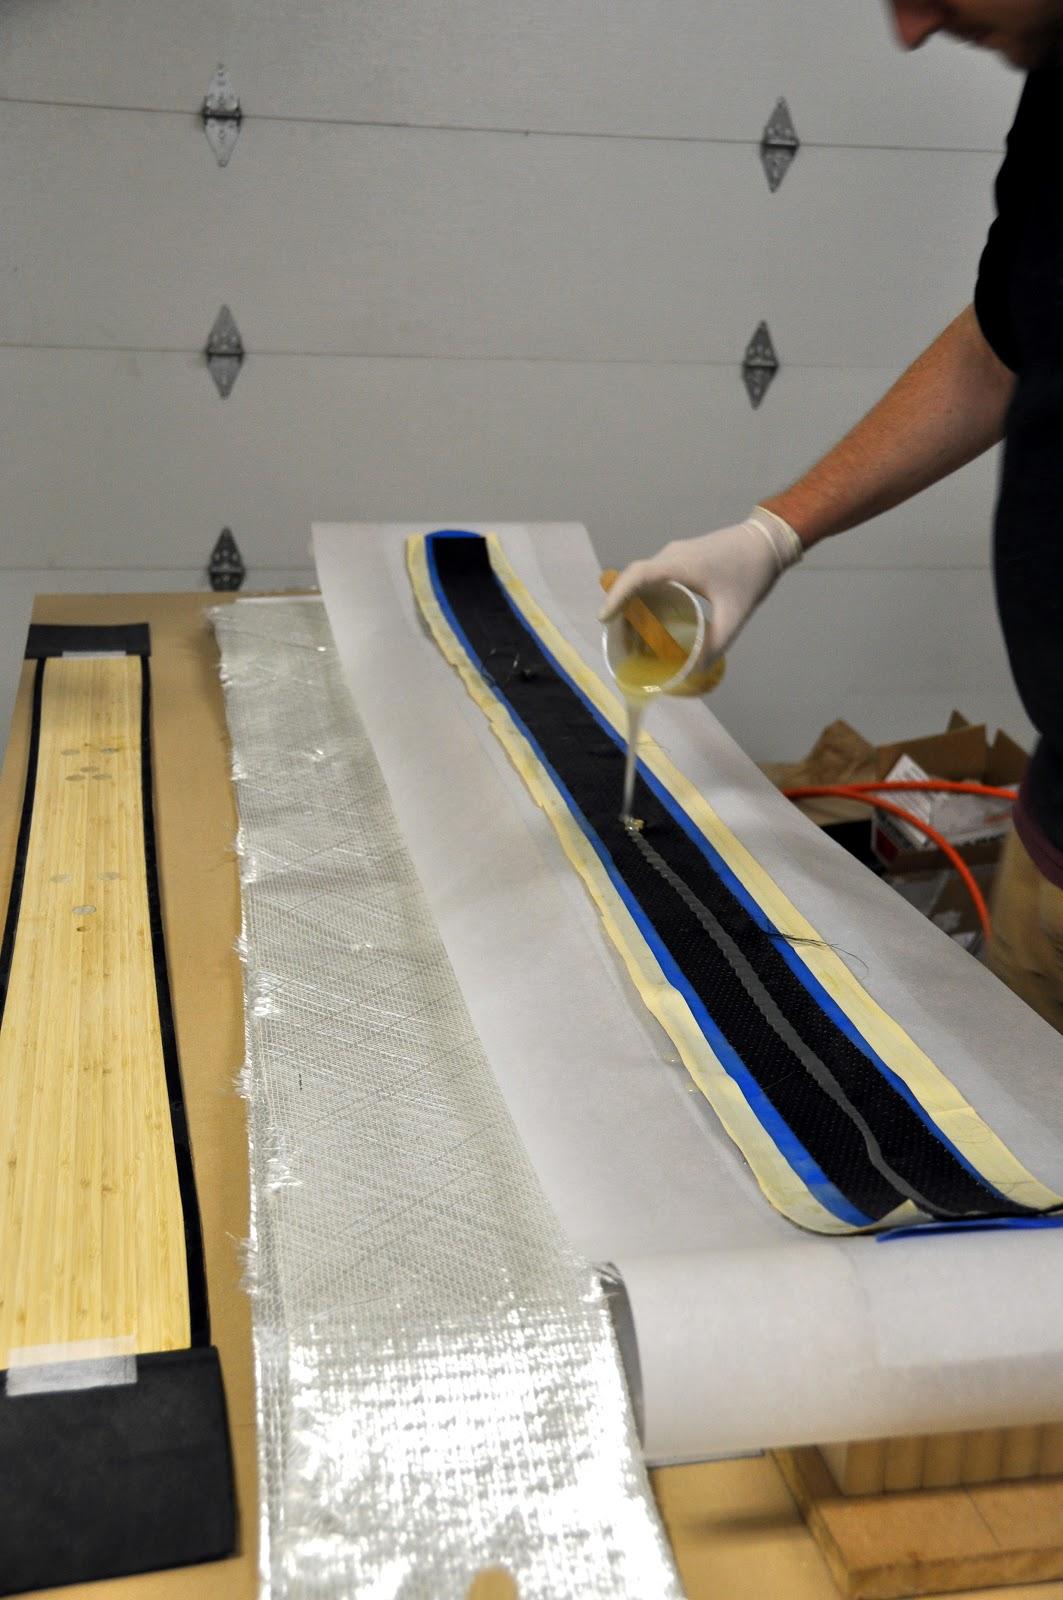 Experiment Powder Skis Materials And Processes Uw